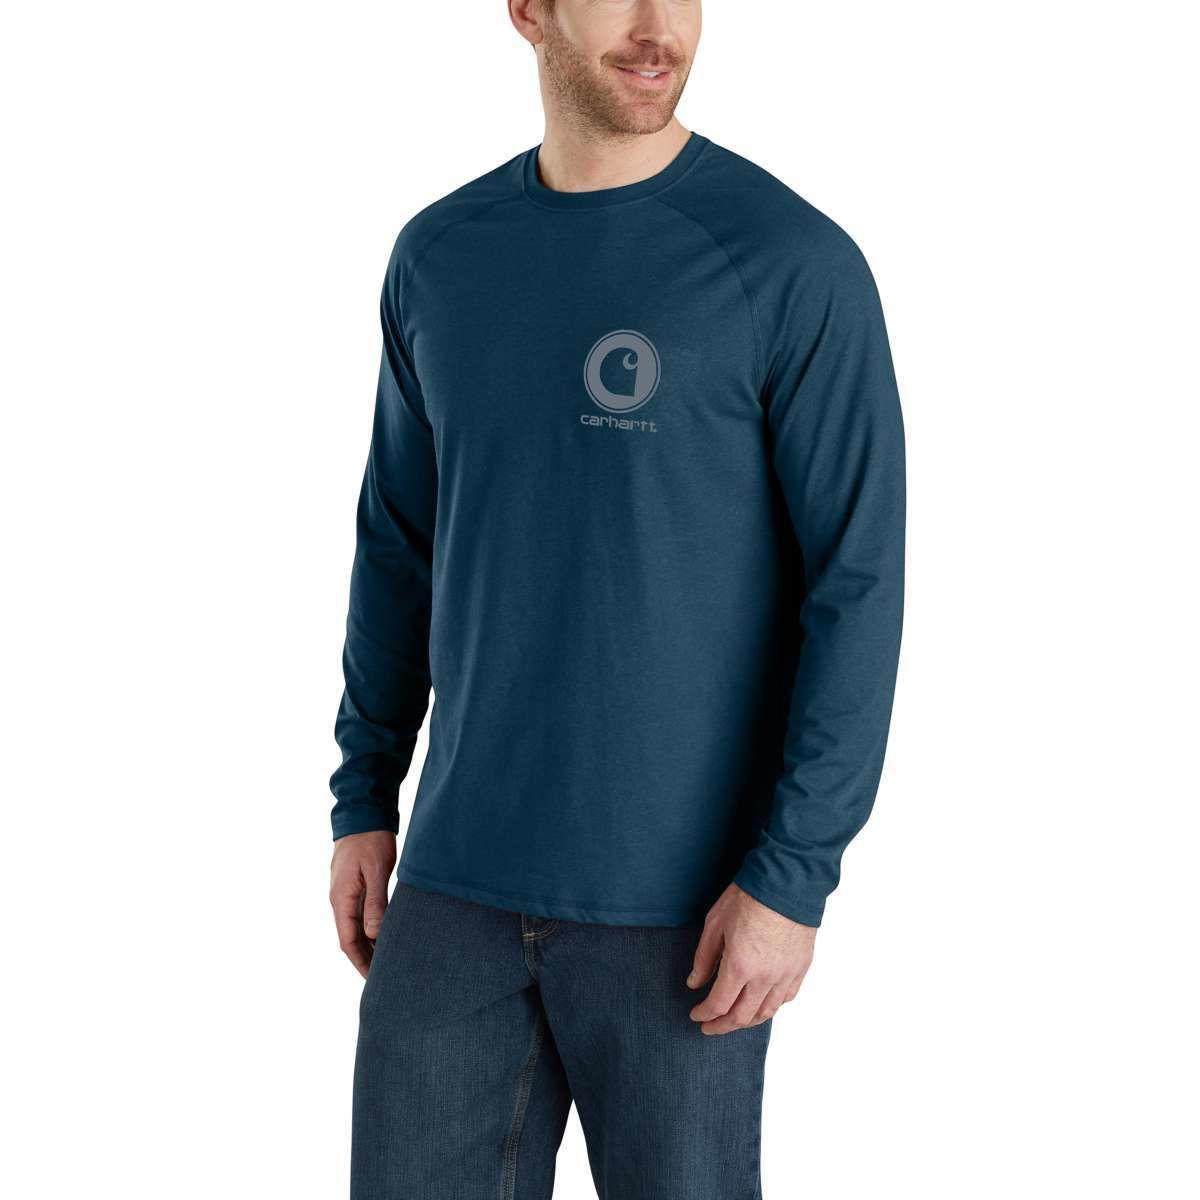 Carhartt Men's Force Delmont Long-Sleeve Graphic Tee - Blue, XL